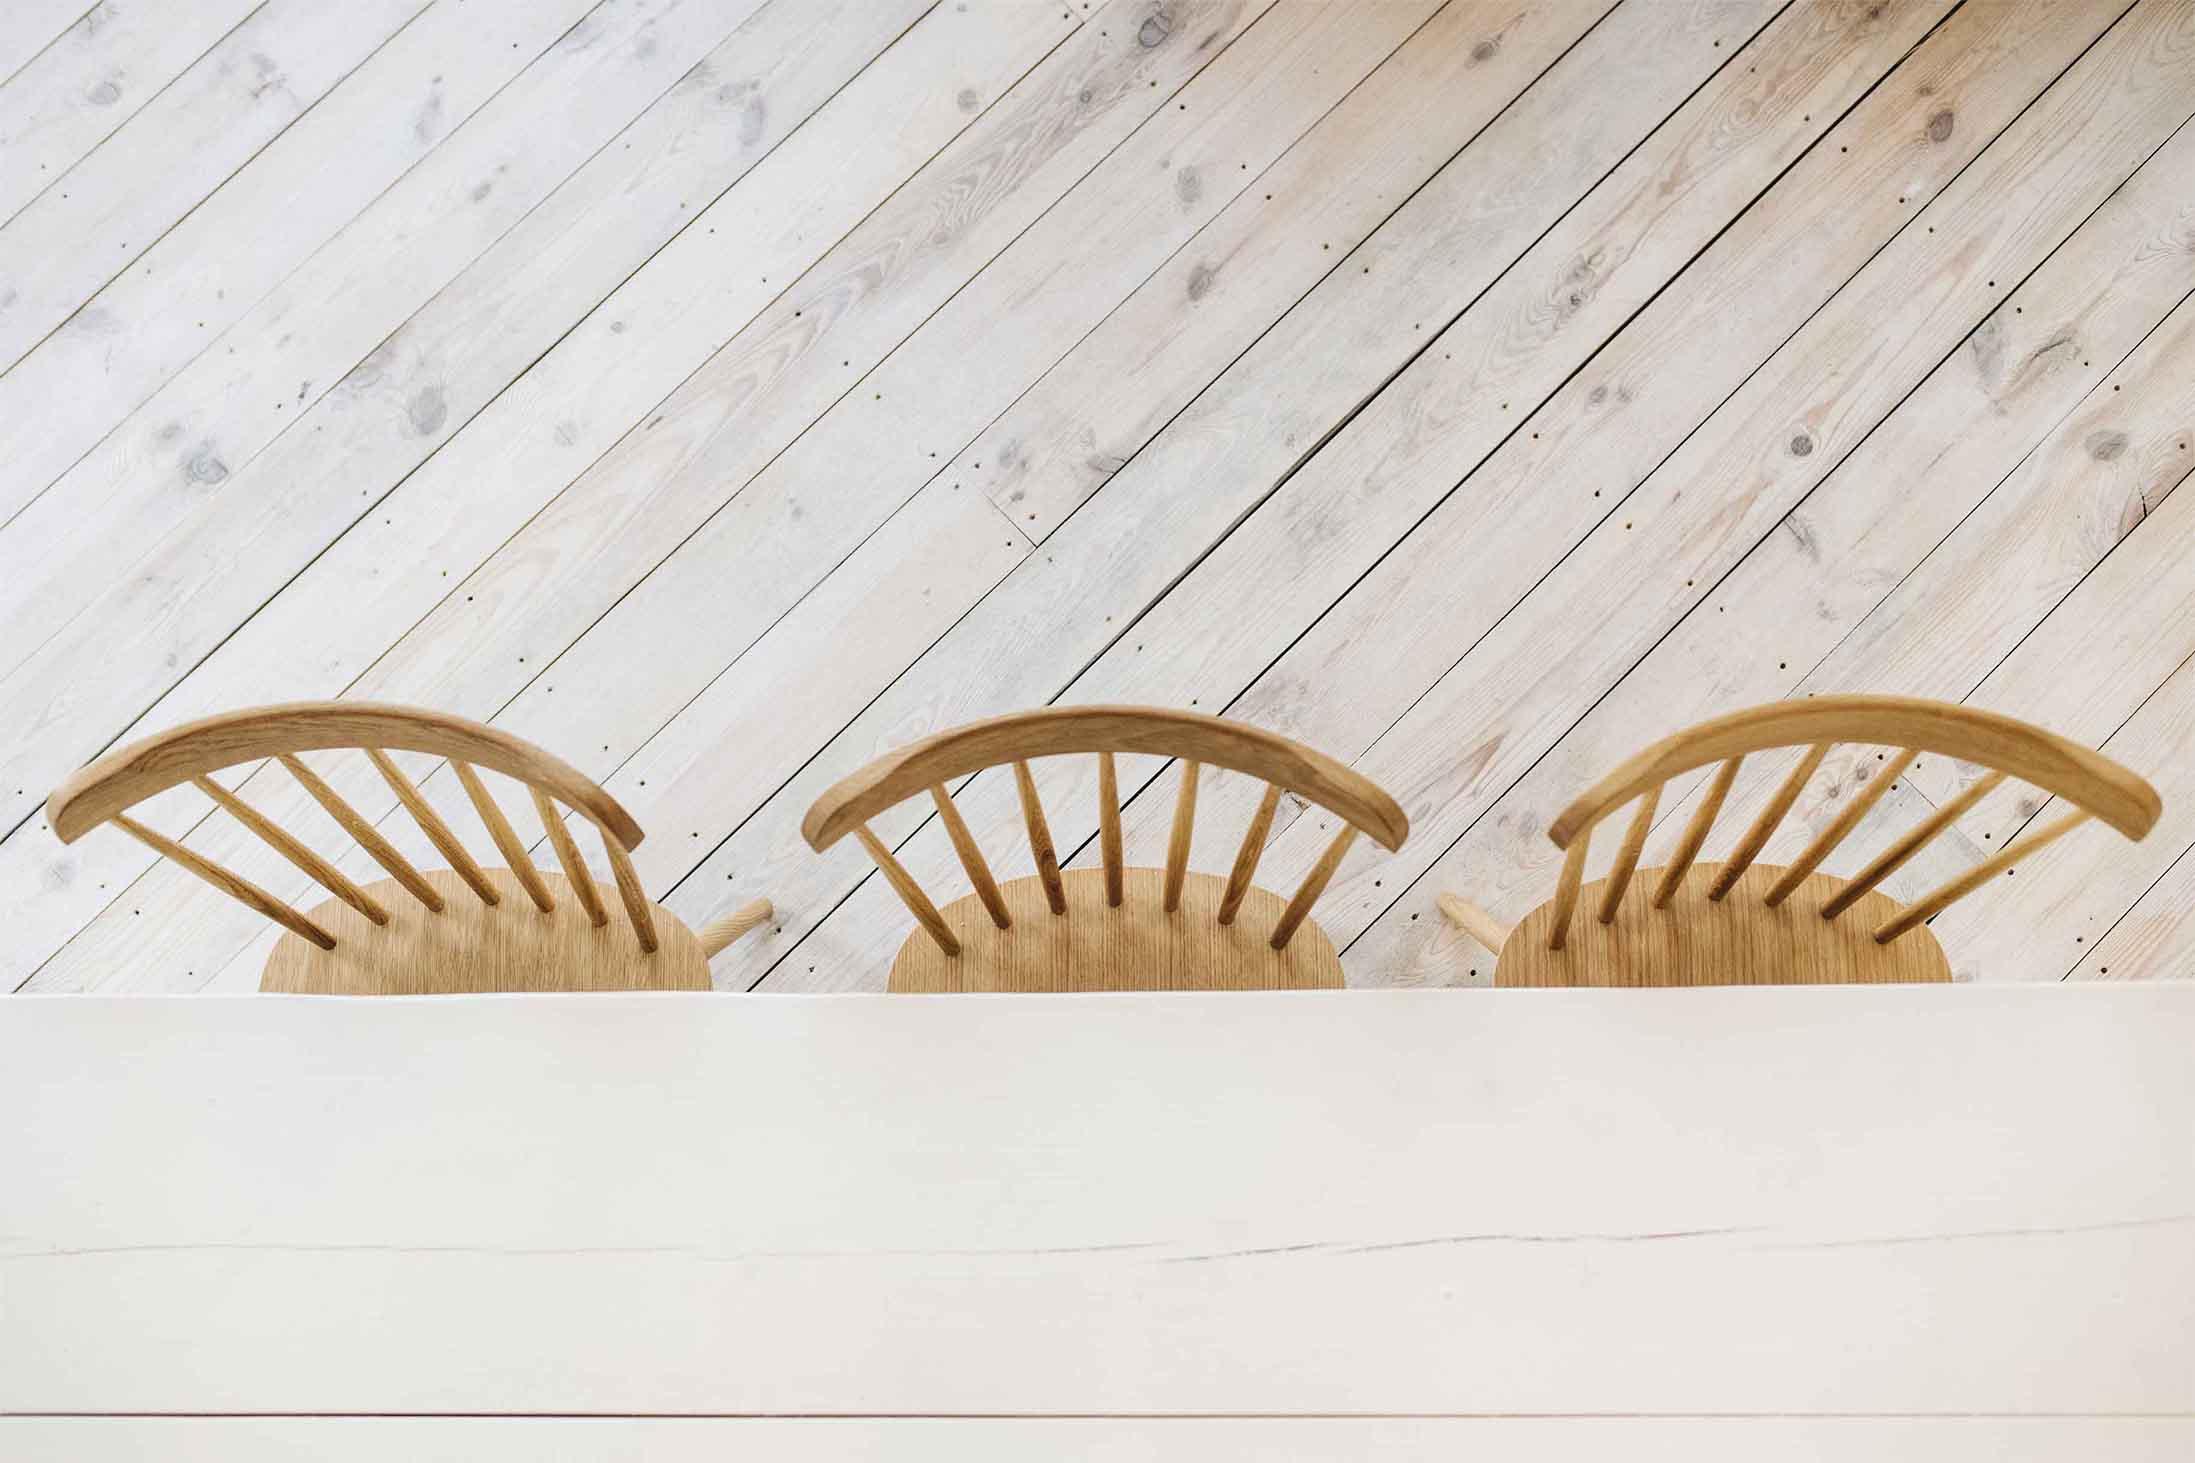 Pekárna Chleba se solí, Včelná - detail dřevěného stolu, židle TON, prkenná borovicová podlaha. Autor: KURZ architekti